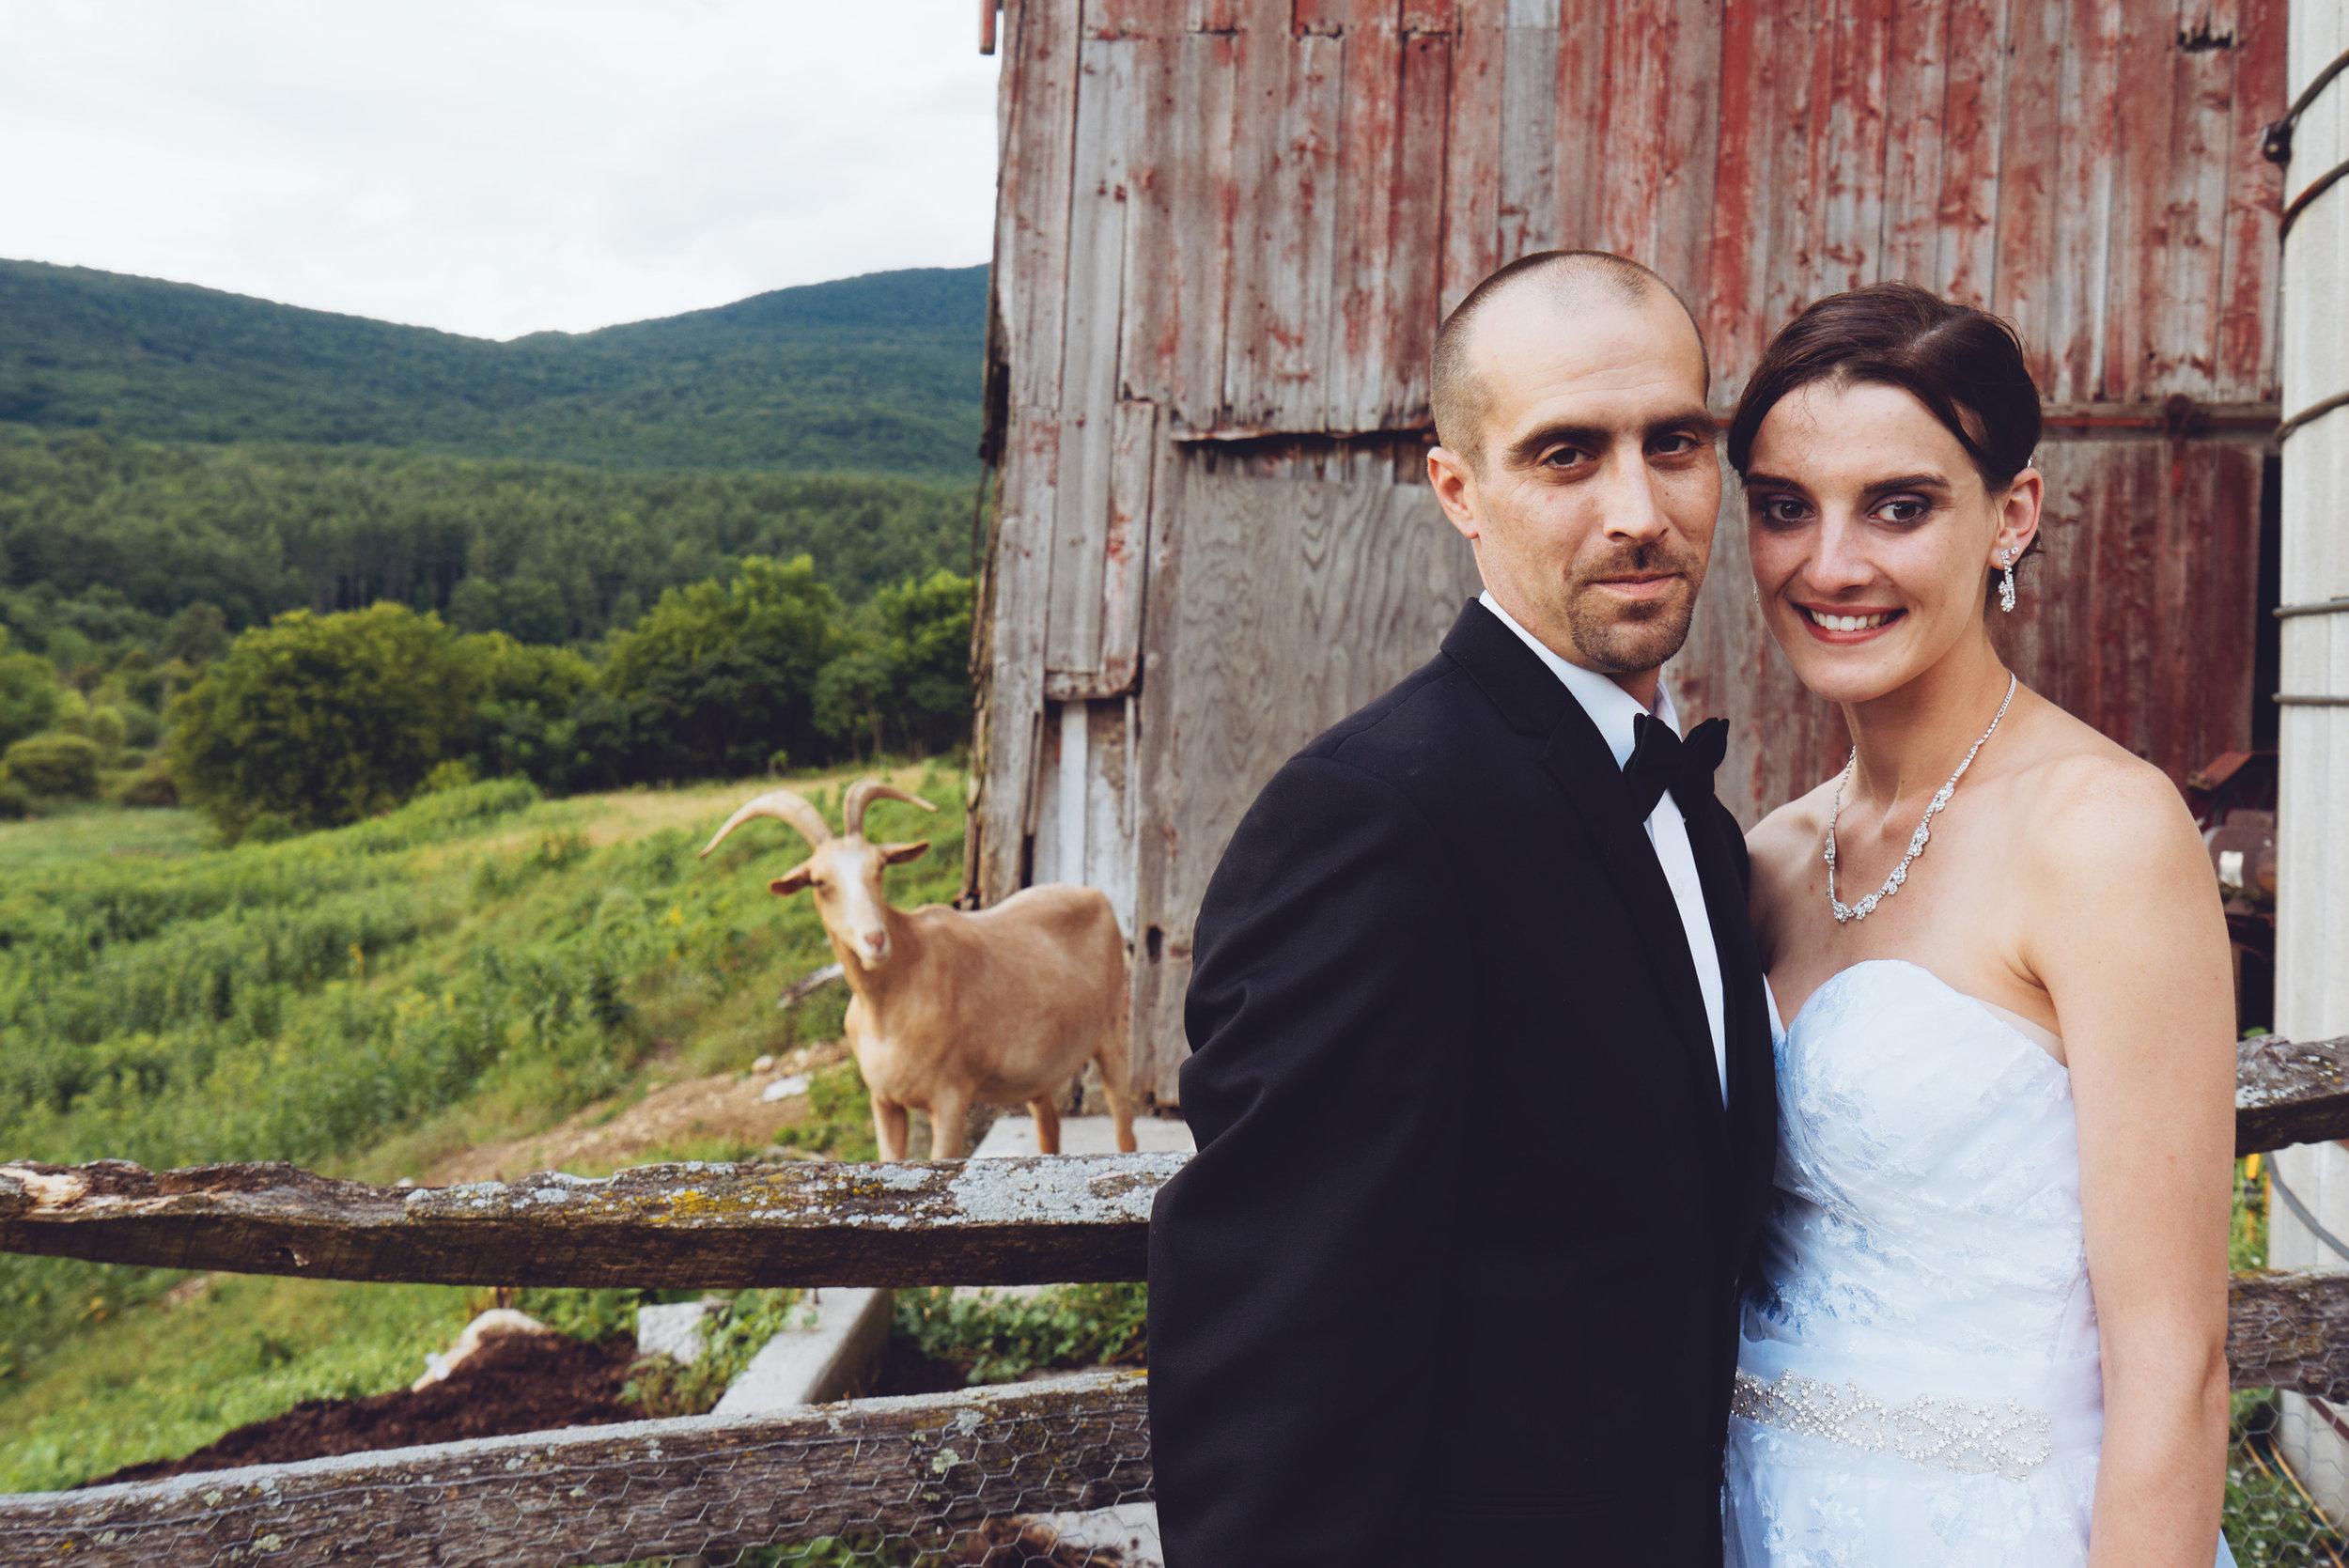 Anna&Chris_Couple_Barn_Vermont_Goat.jpg